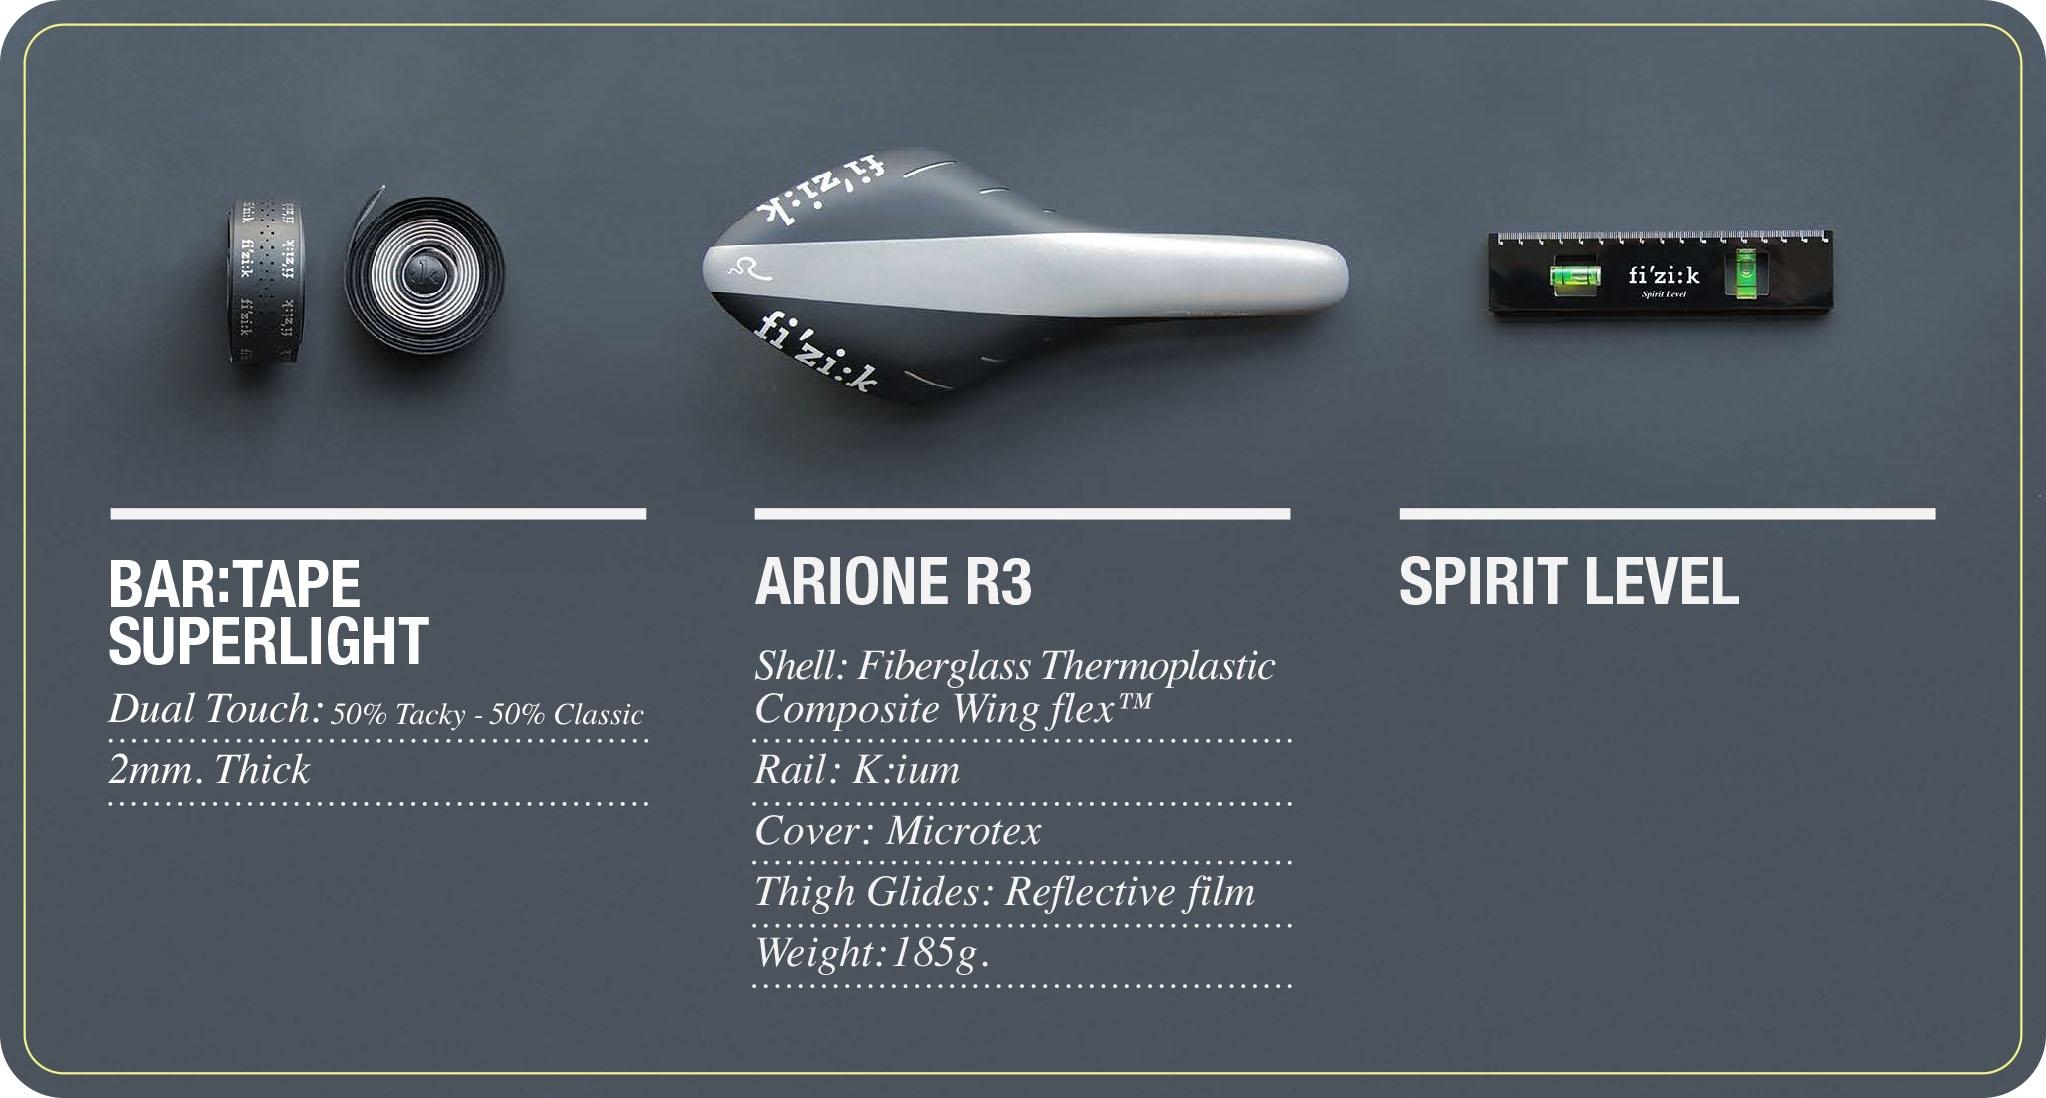 Arione R3 Tour Edition